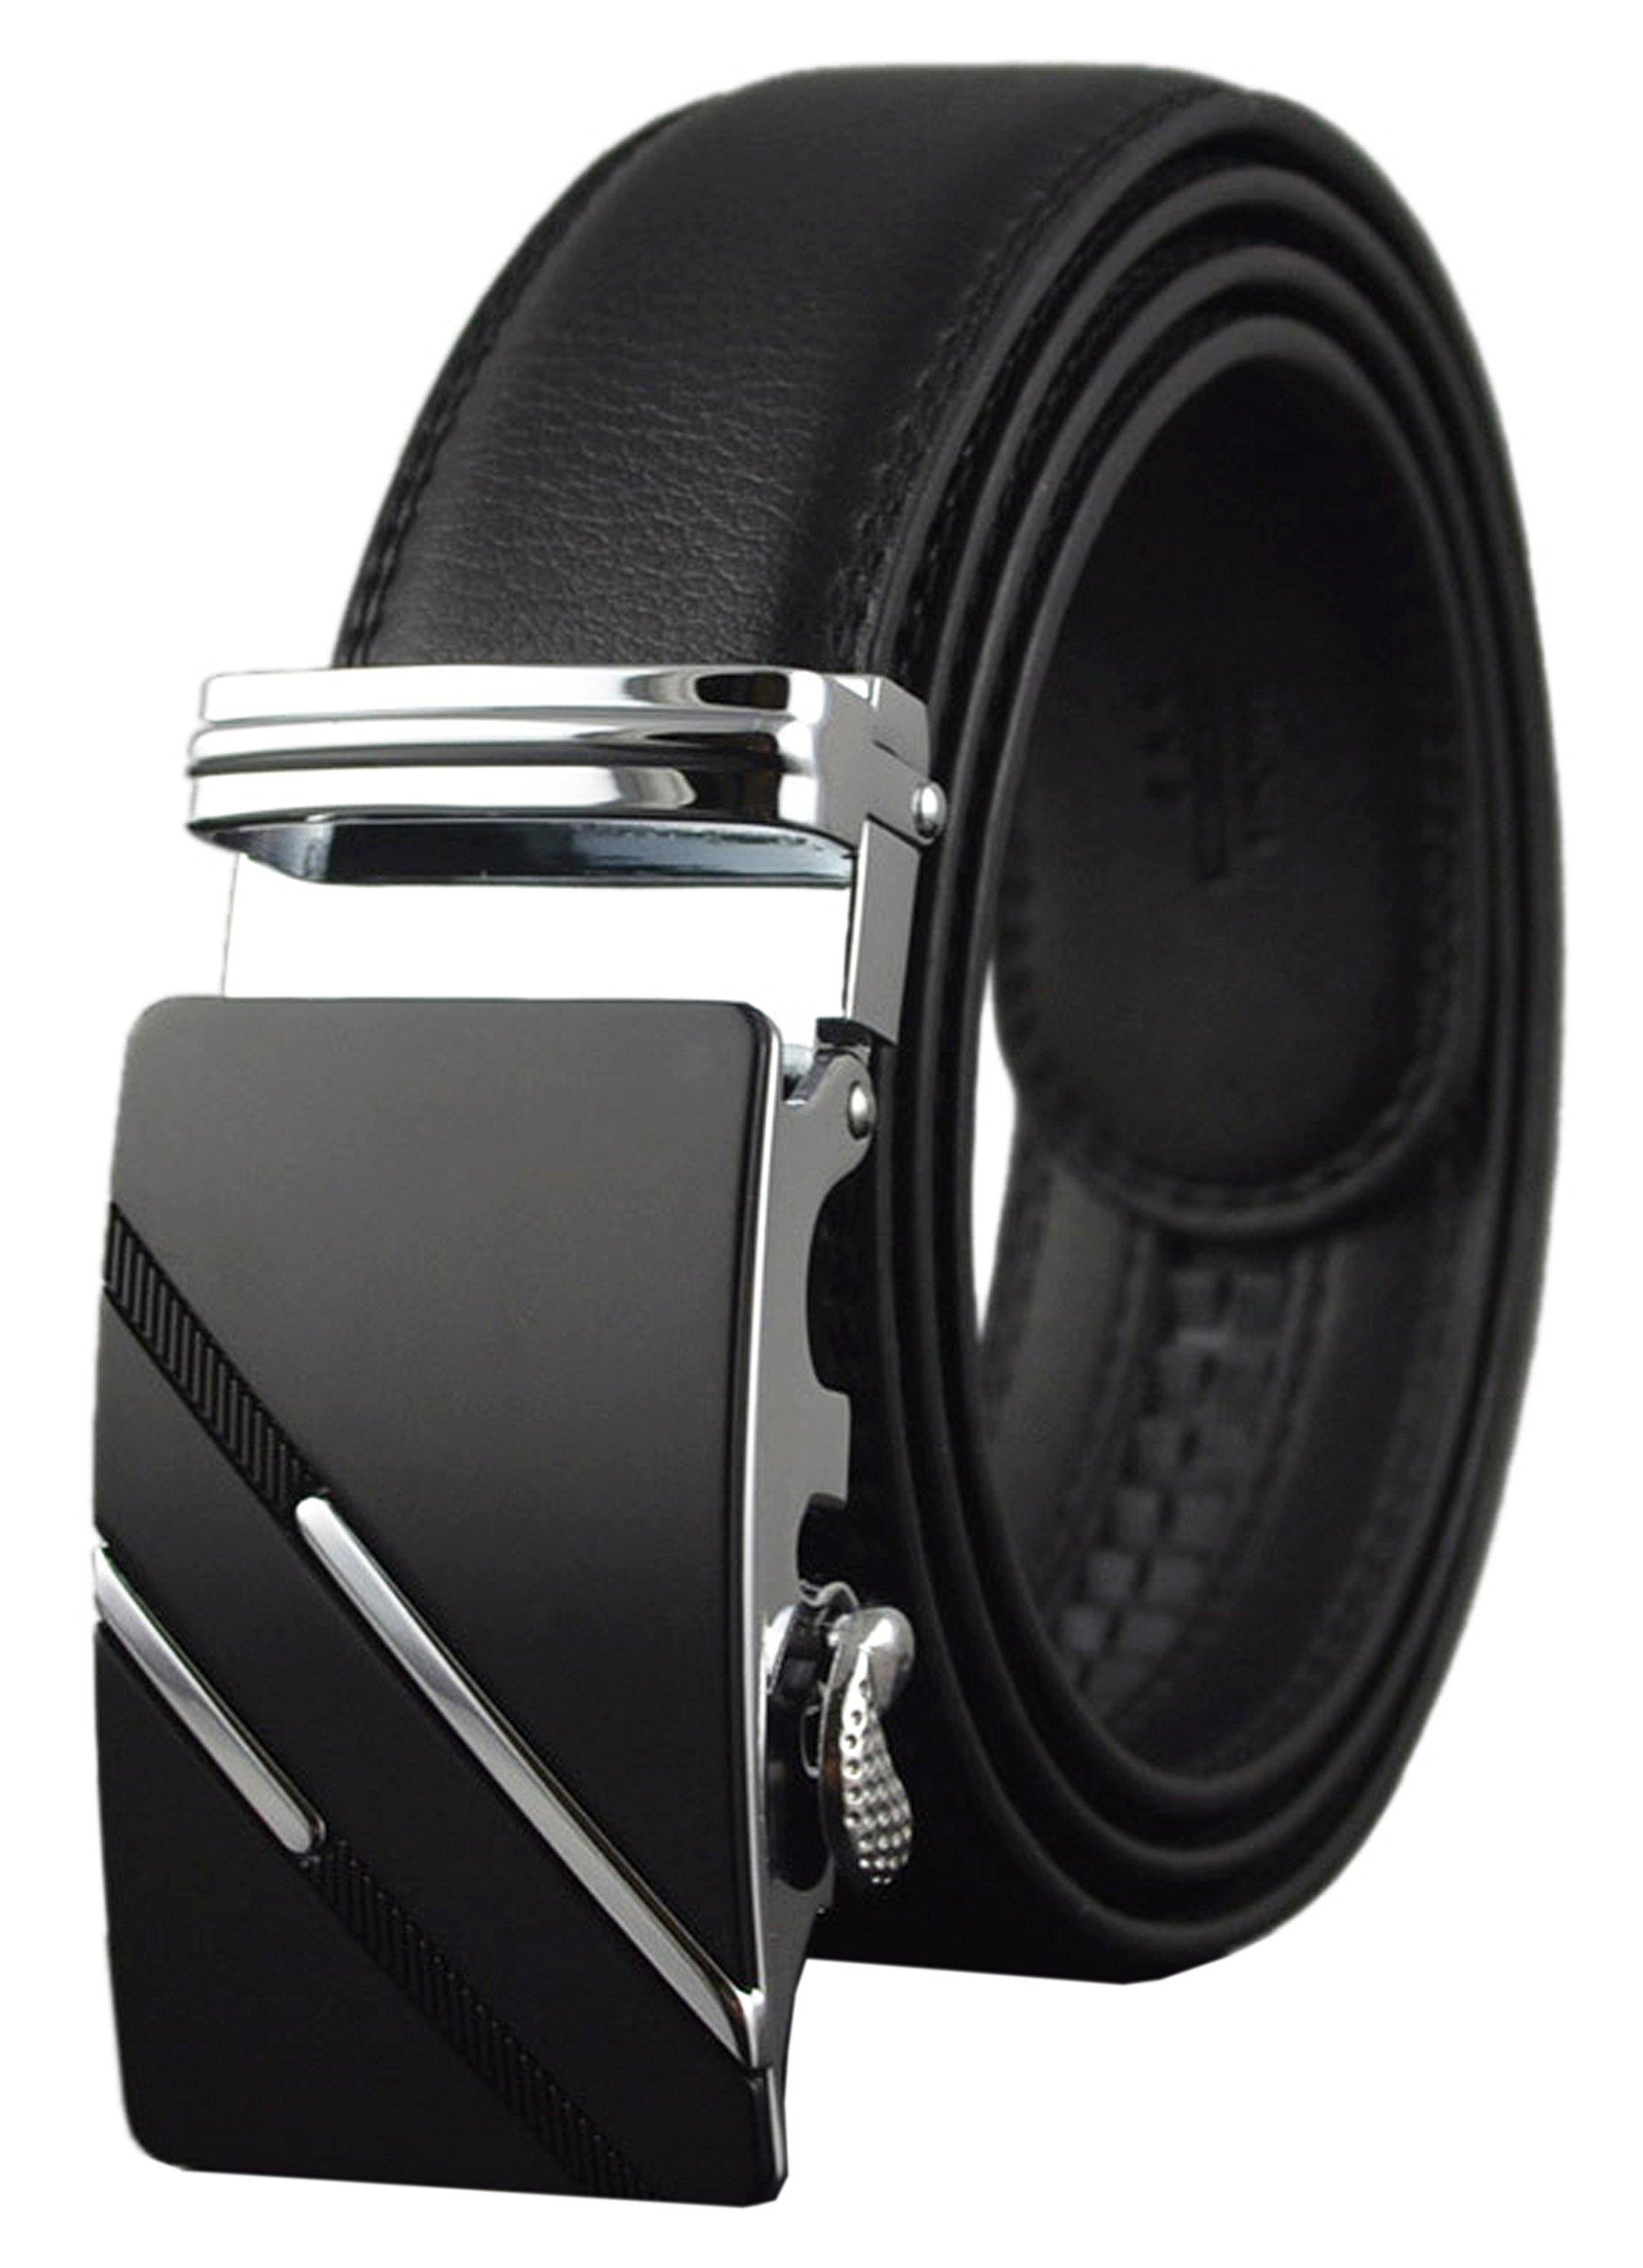 Mens Ratchet Slide Belts Leather Automatic Buckle - Black,137-S